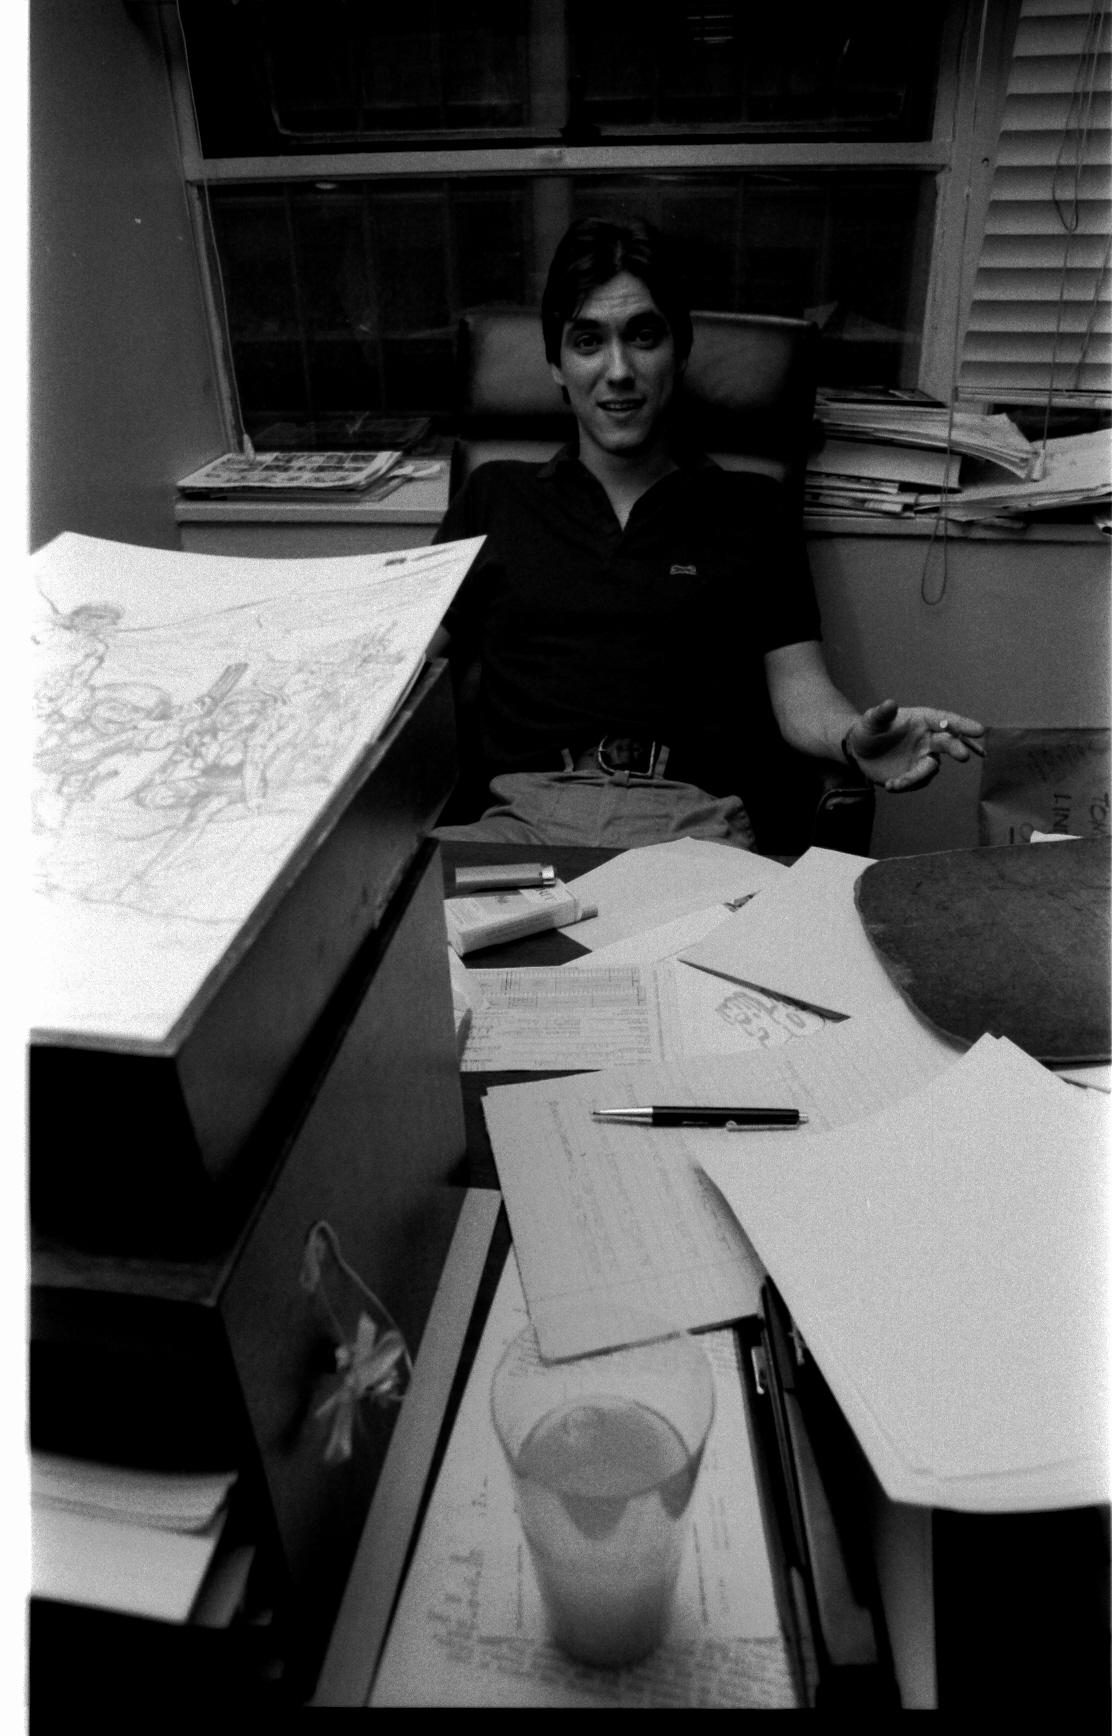 Bob Layton tirelessly fills out art vouchers.